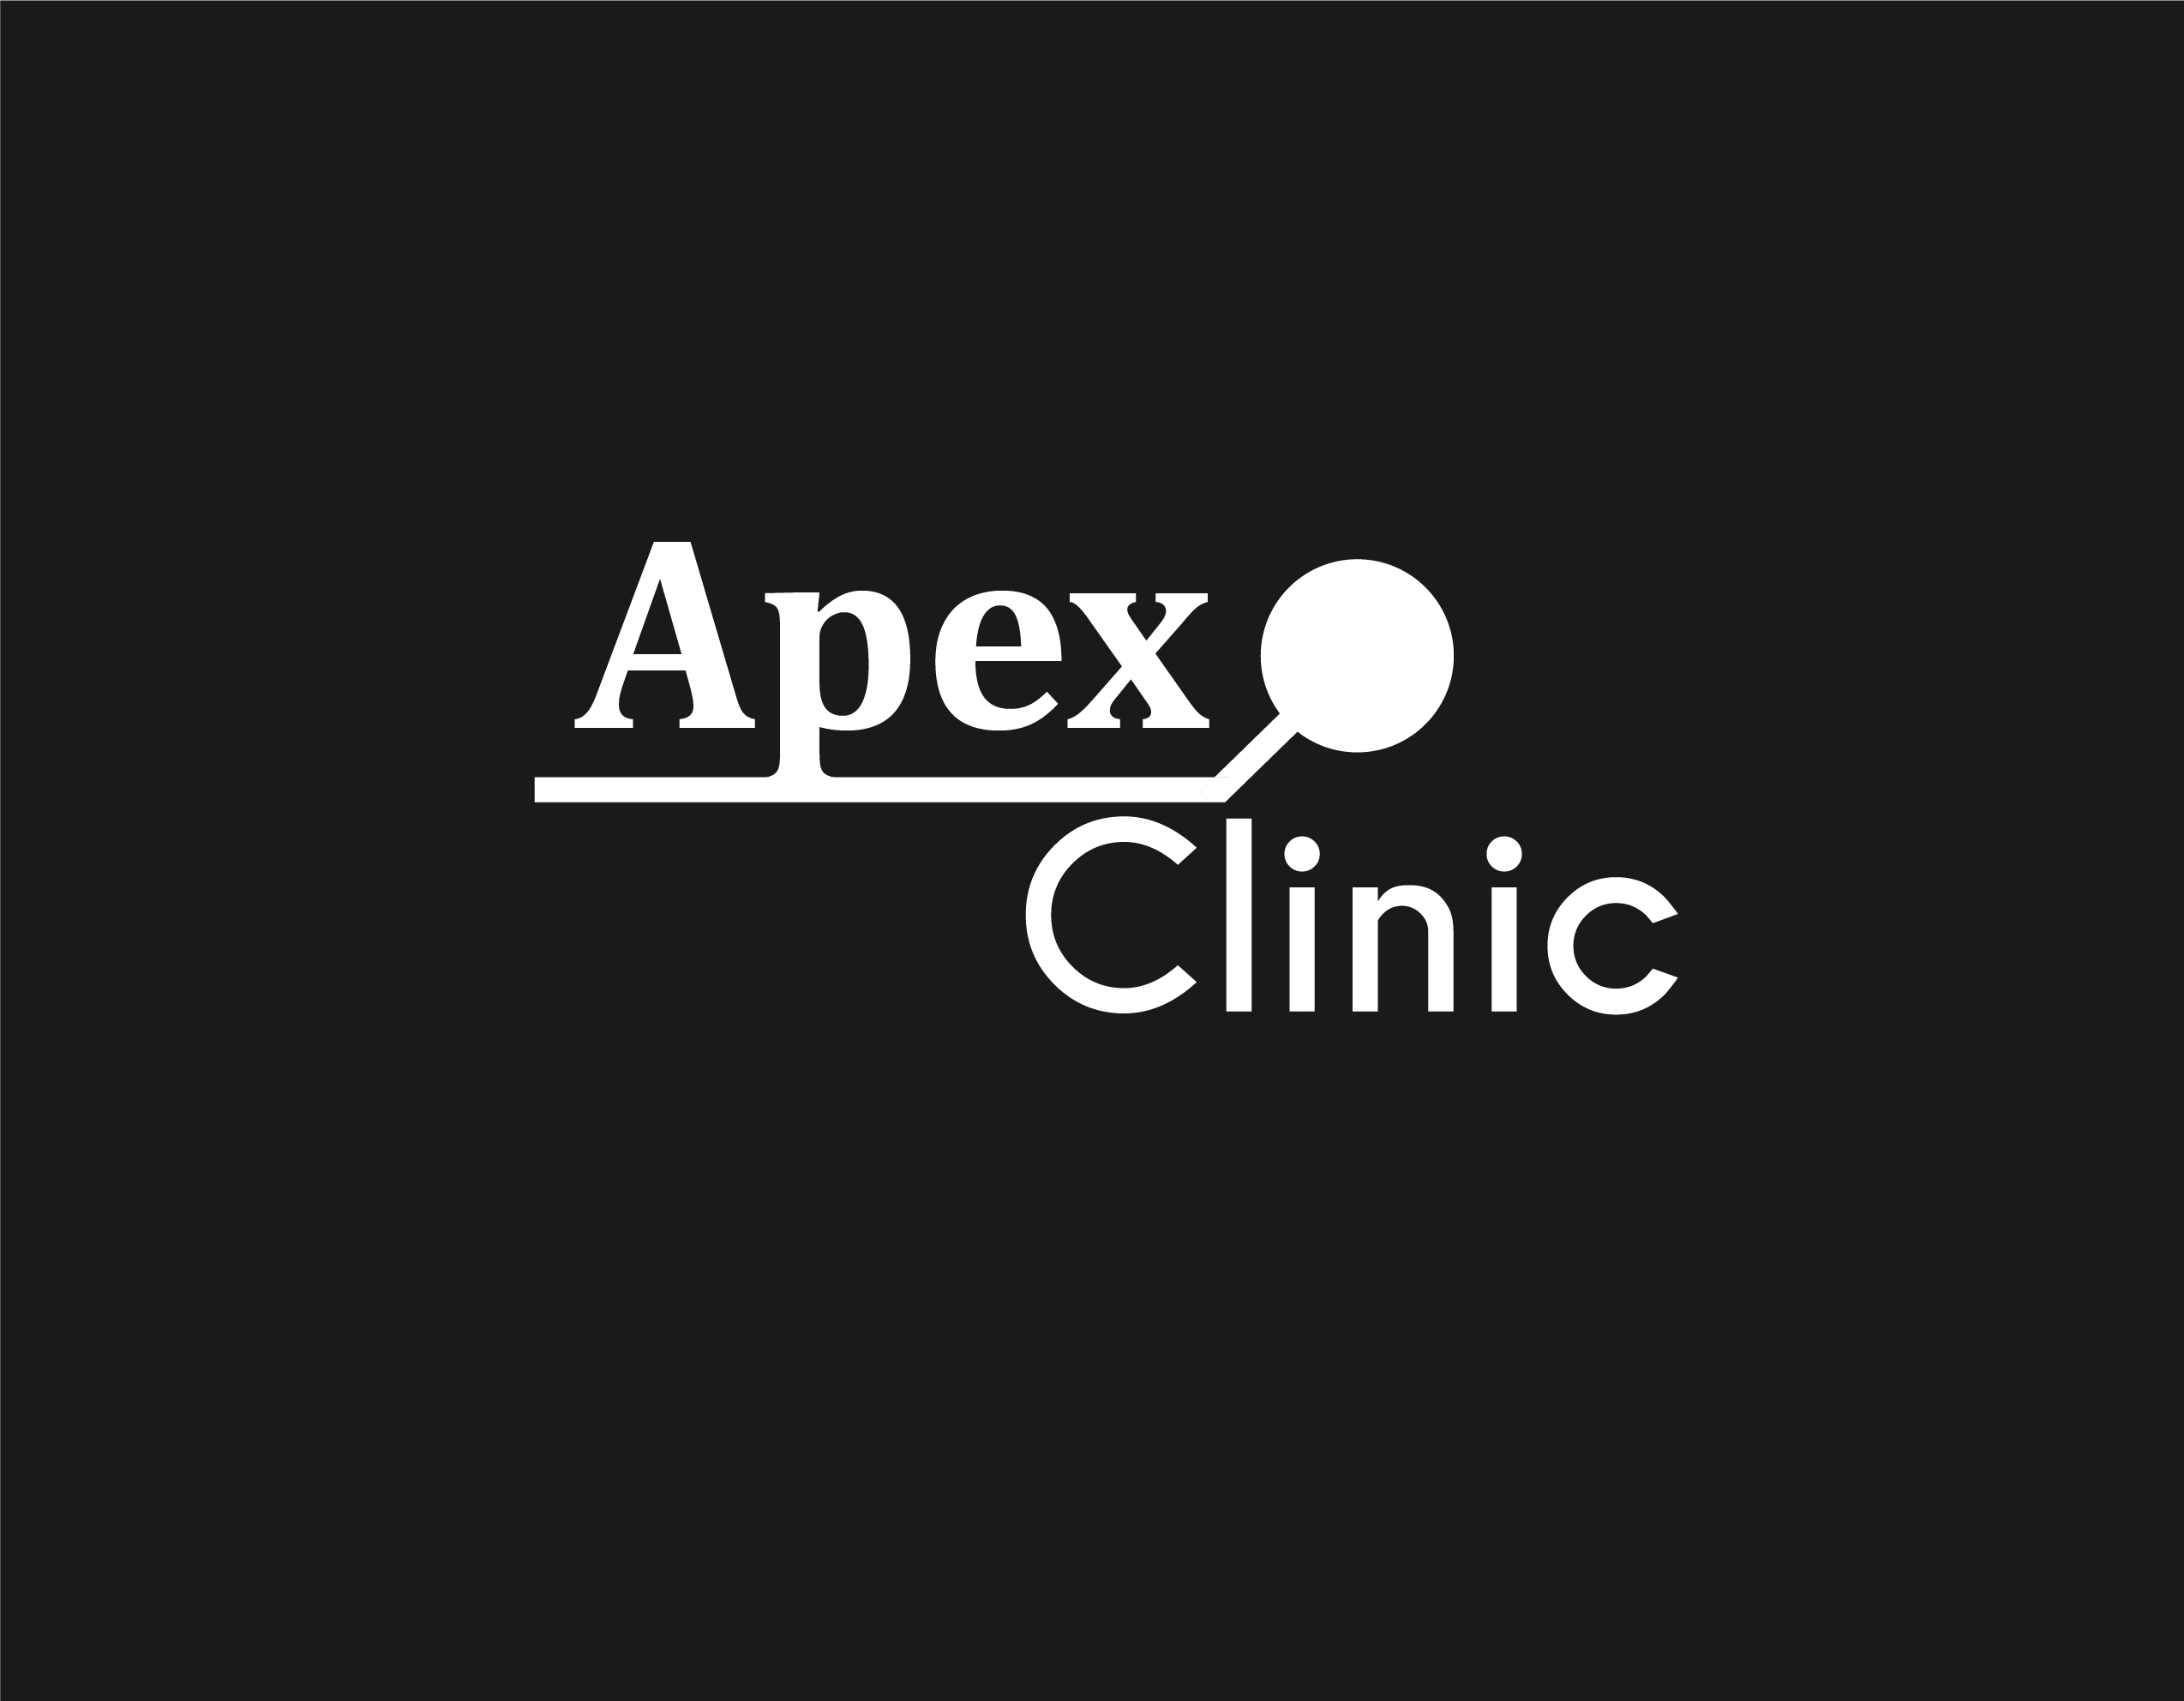 Логотип для стоматологии фото f_2675c9476e59711a.jpg